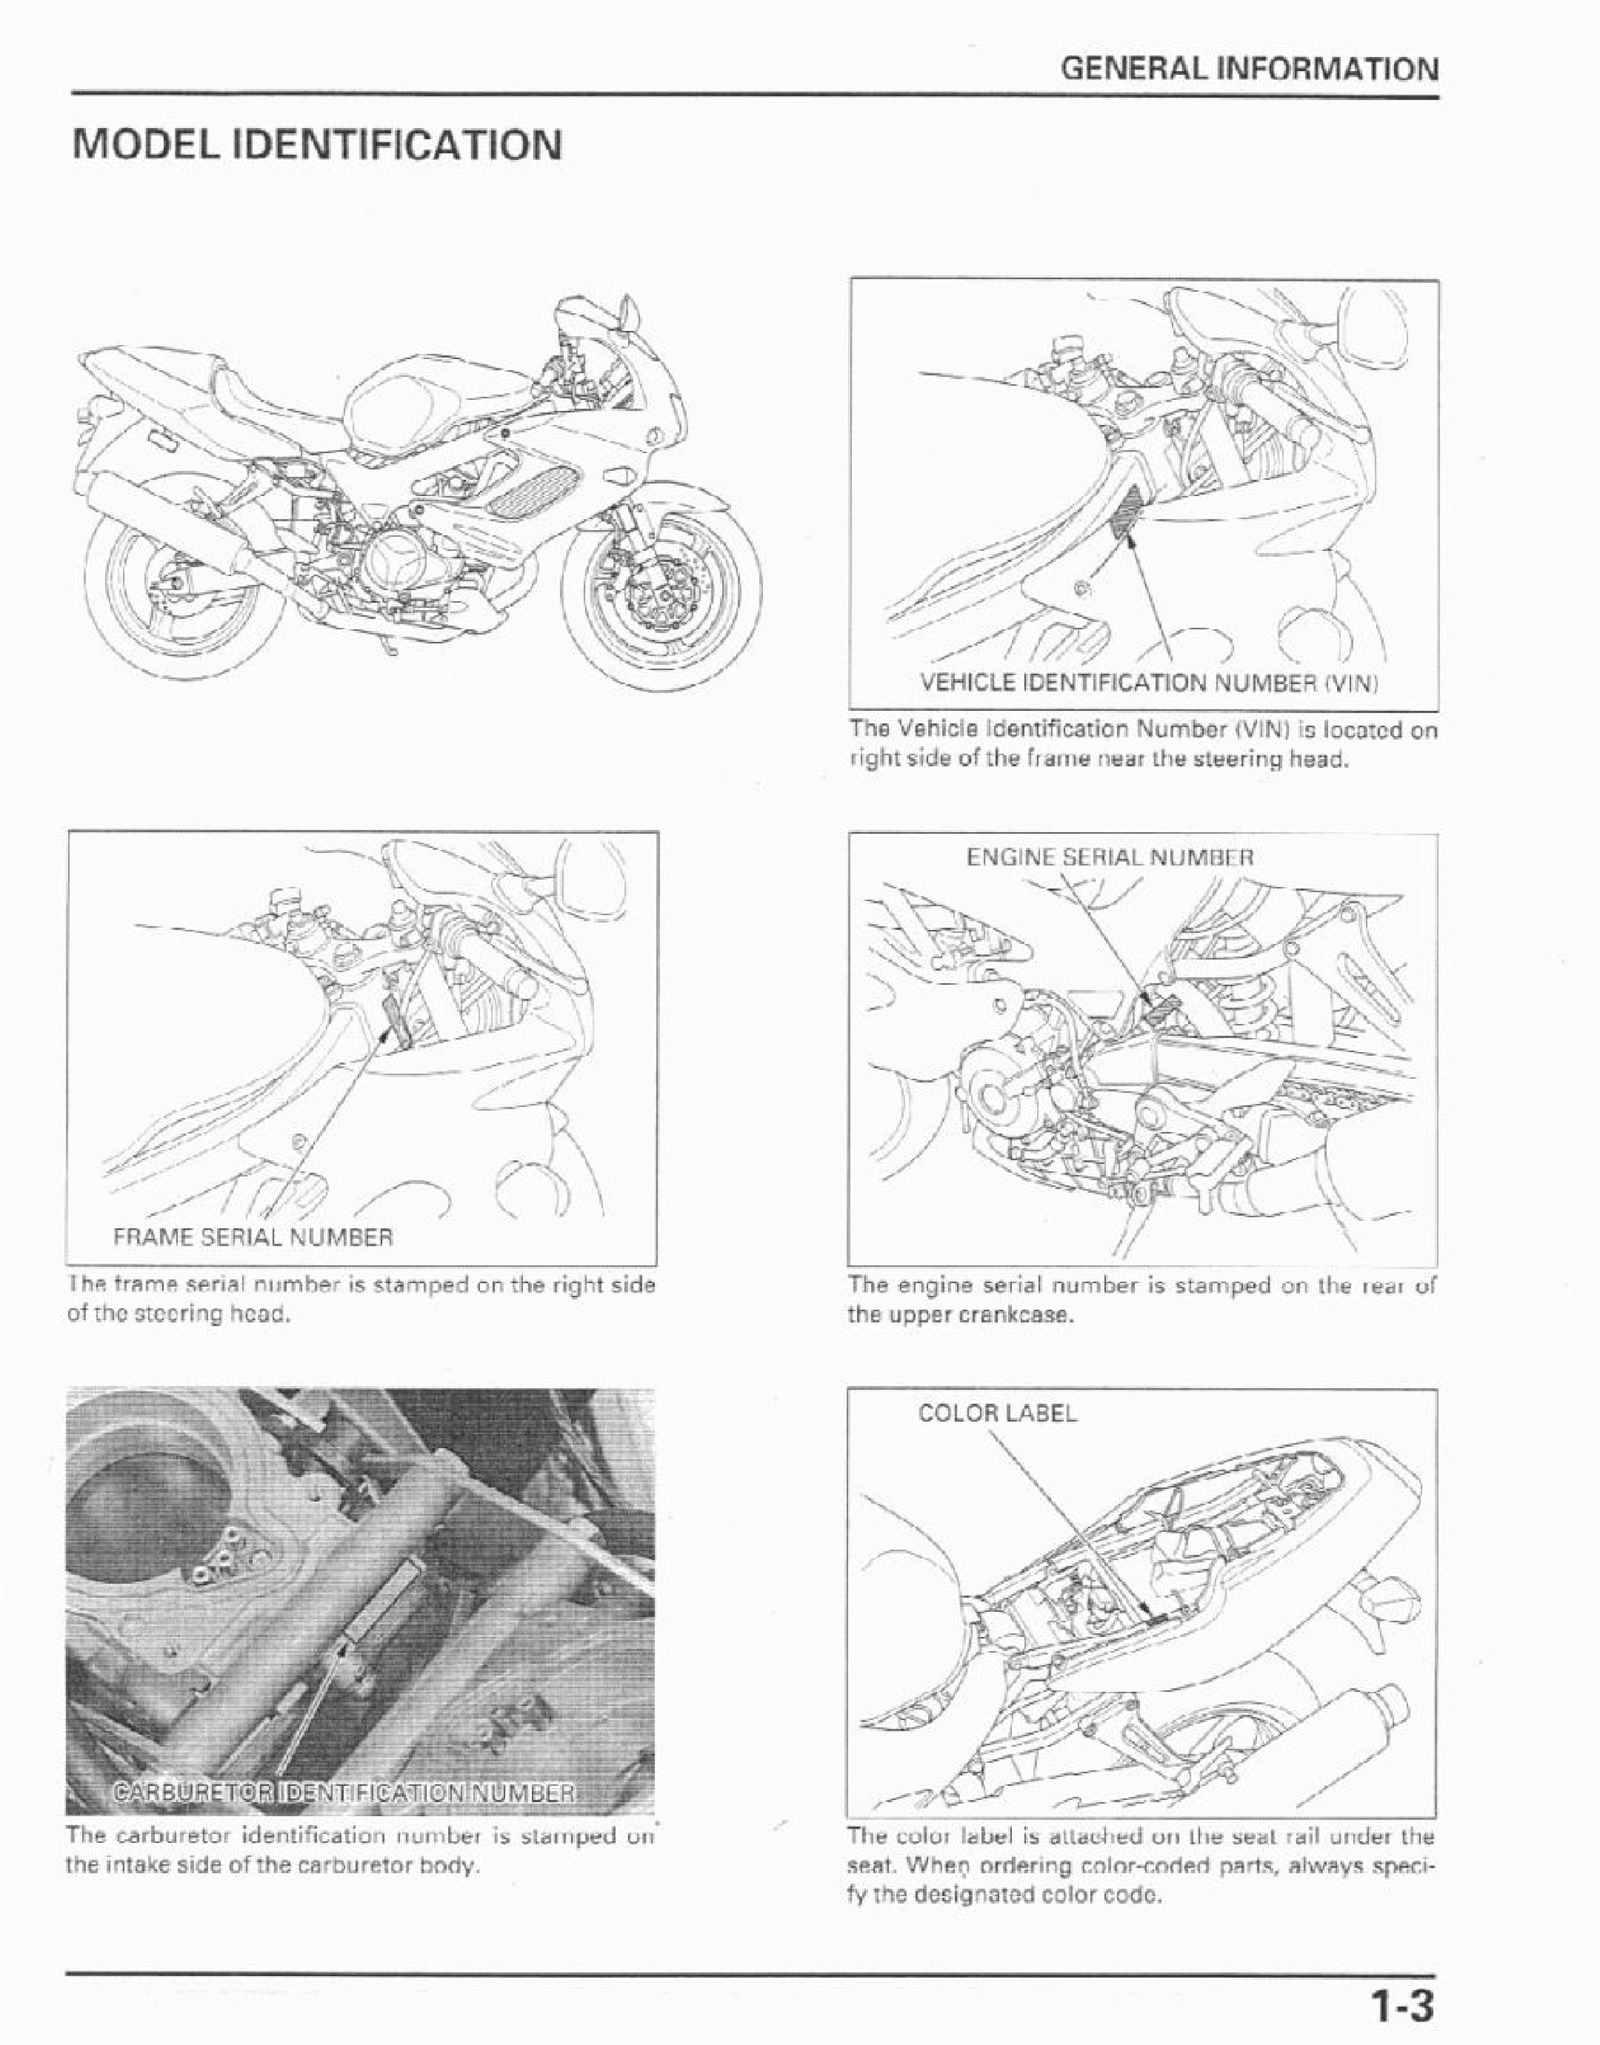 Honda VTR1000F 98-03 Service Manual Free Download